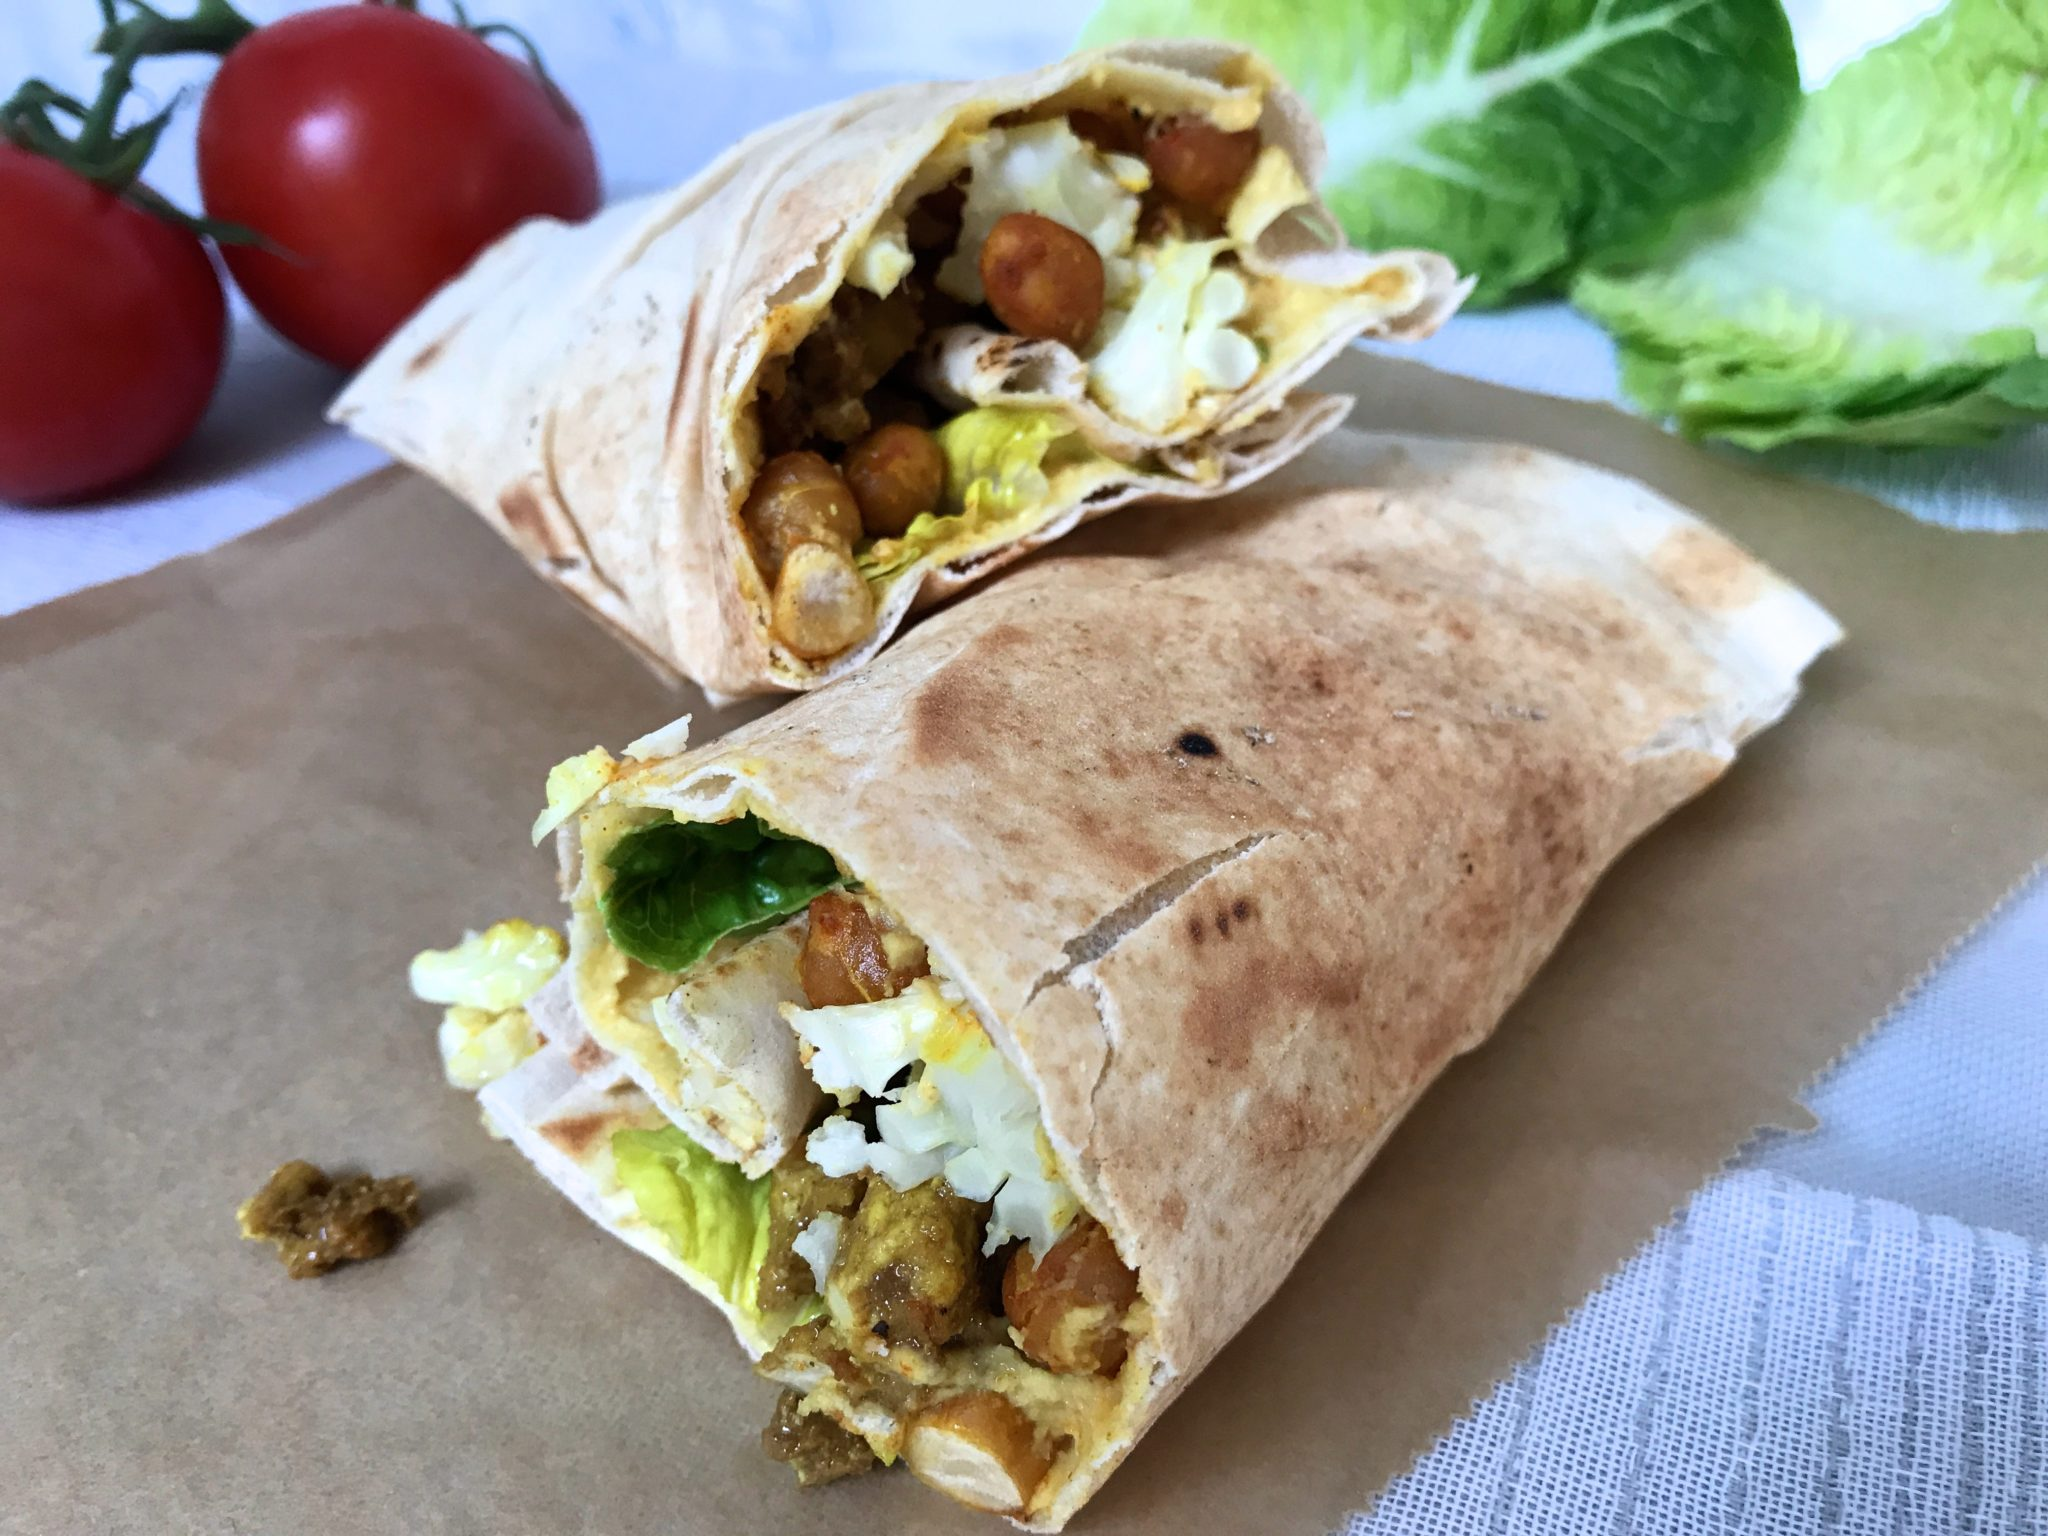 Blumenkohl-Wraps vegan